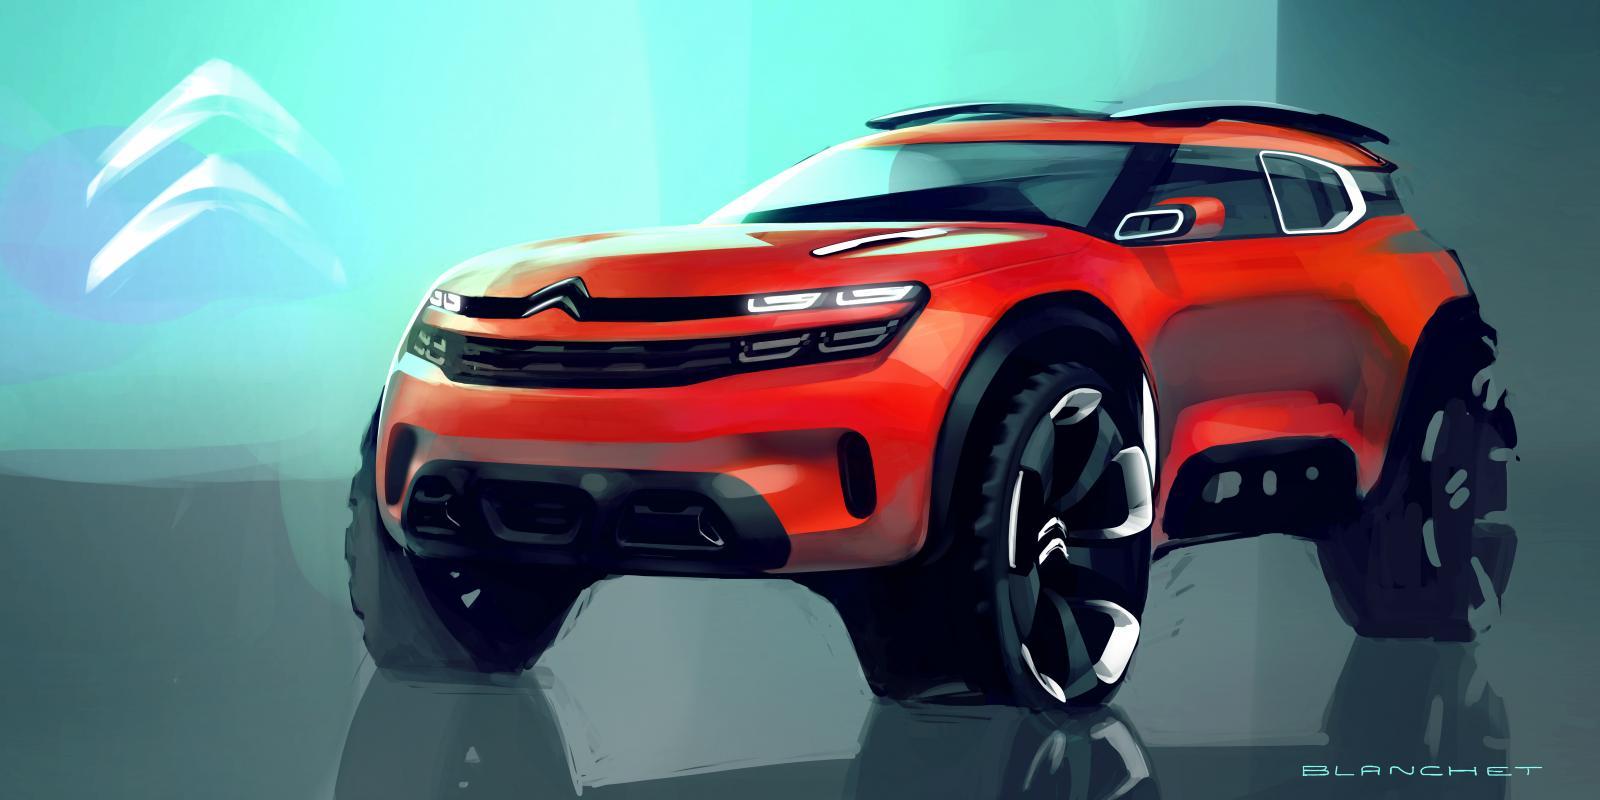 Maquette Concept Aircross